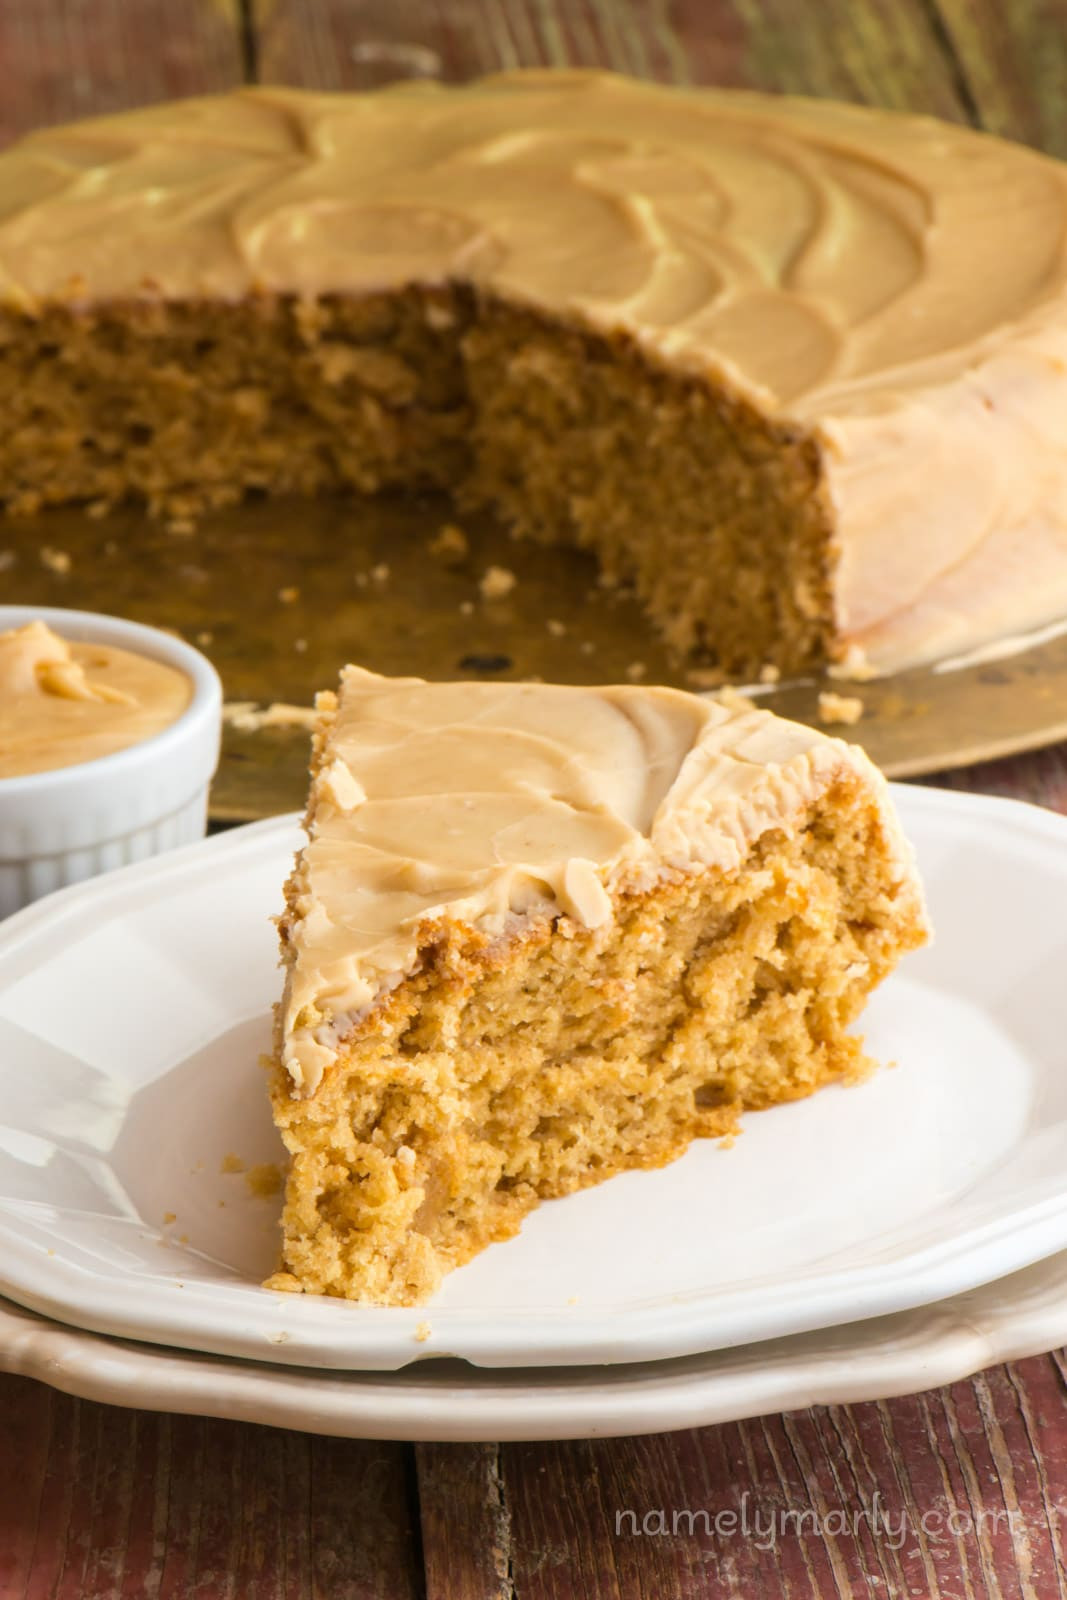 Peanut Butter Cake Recipe  Vegan Peanut Butter Wacky Cake Namely Marly